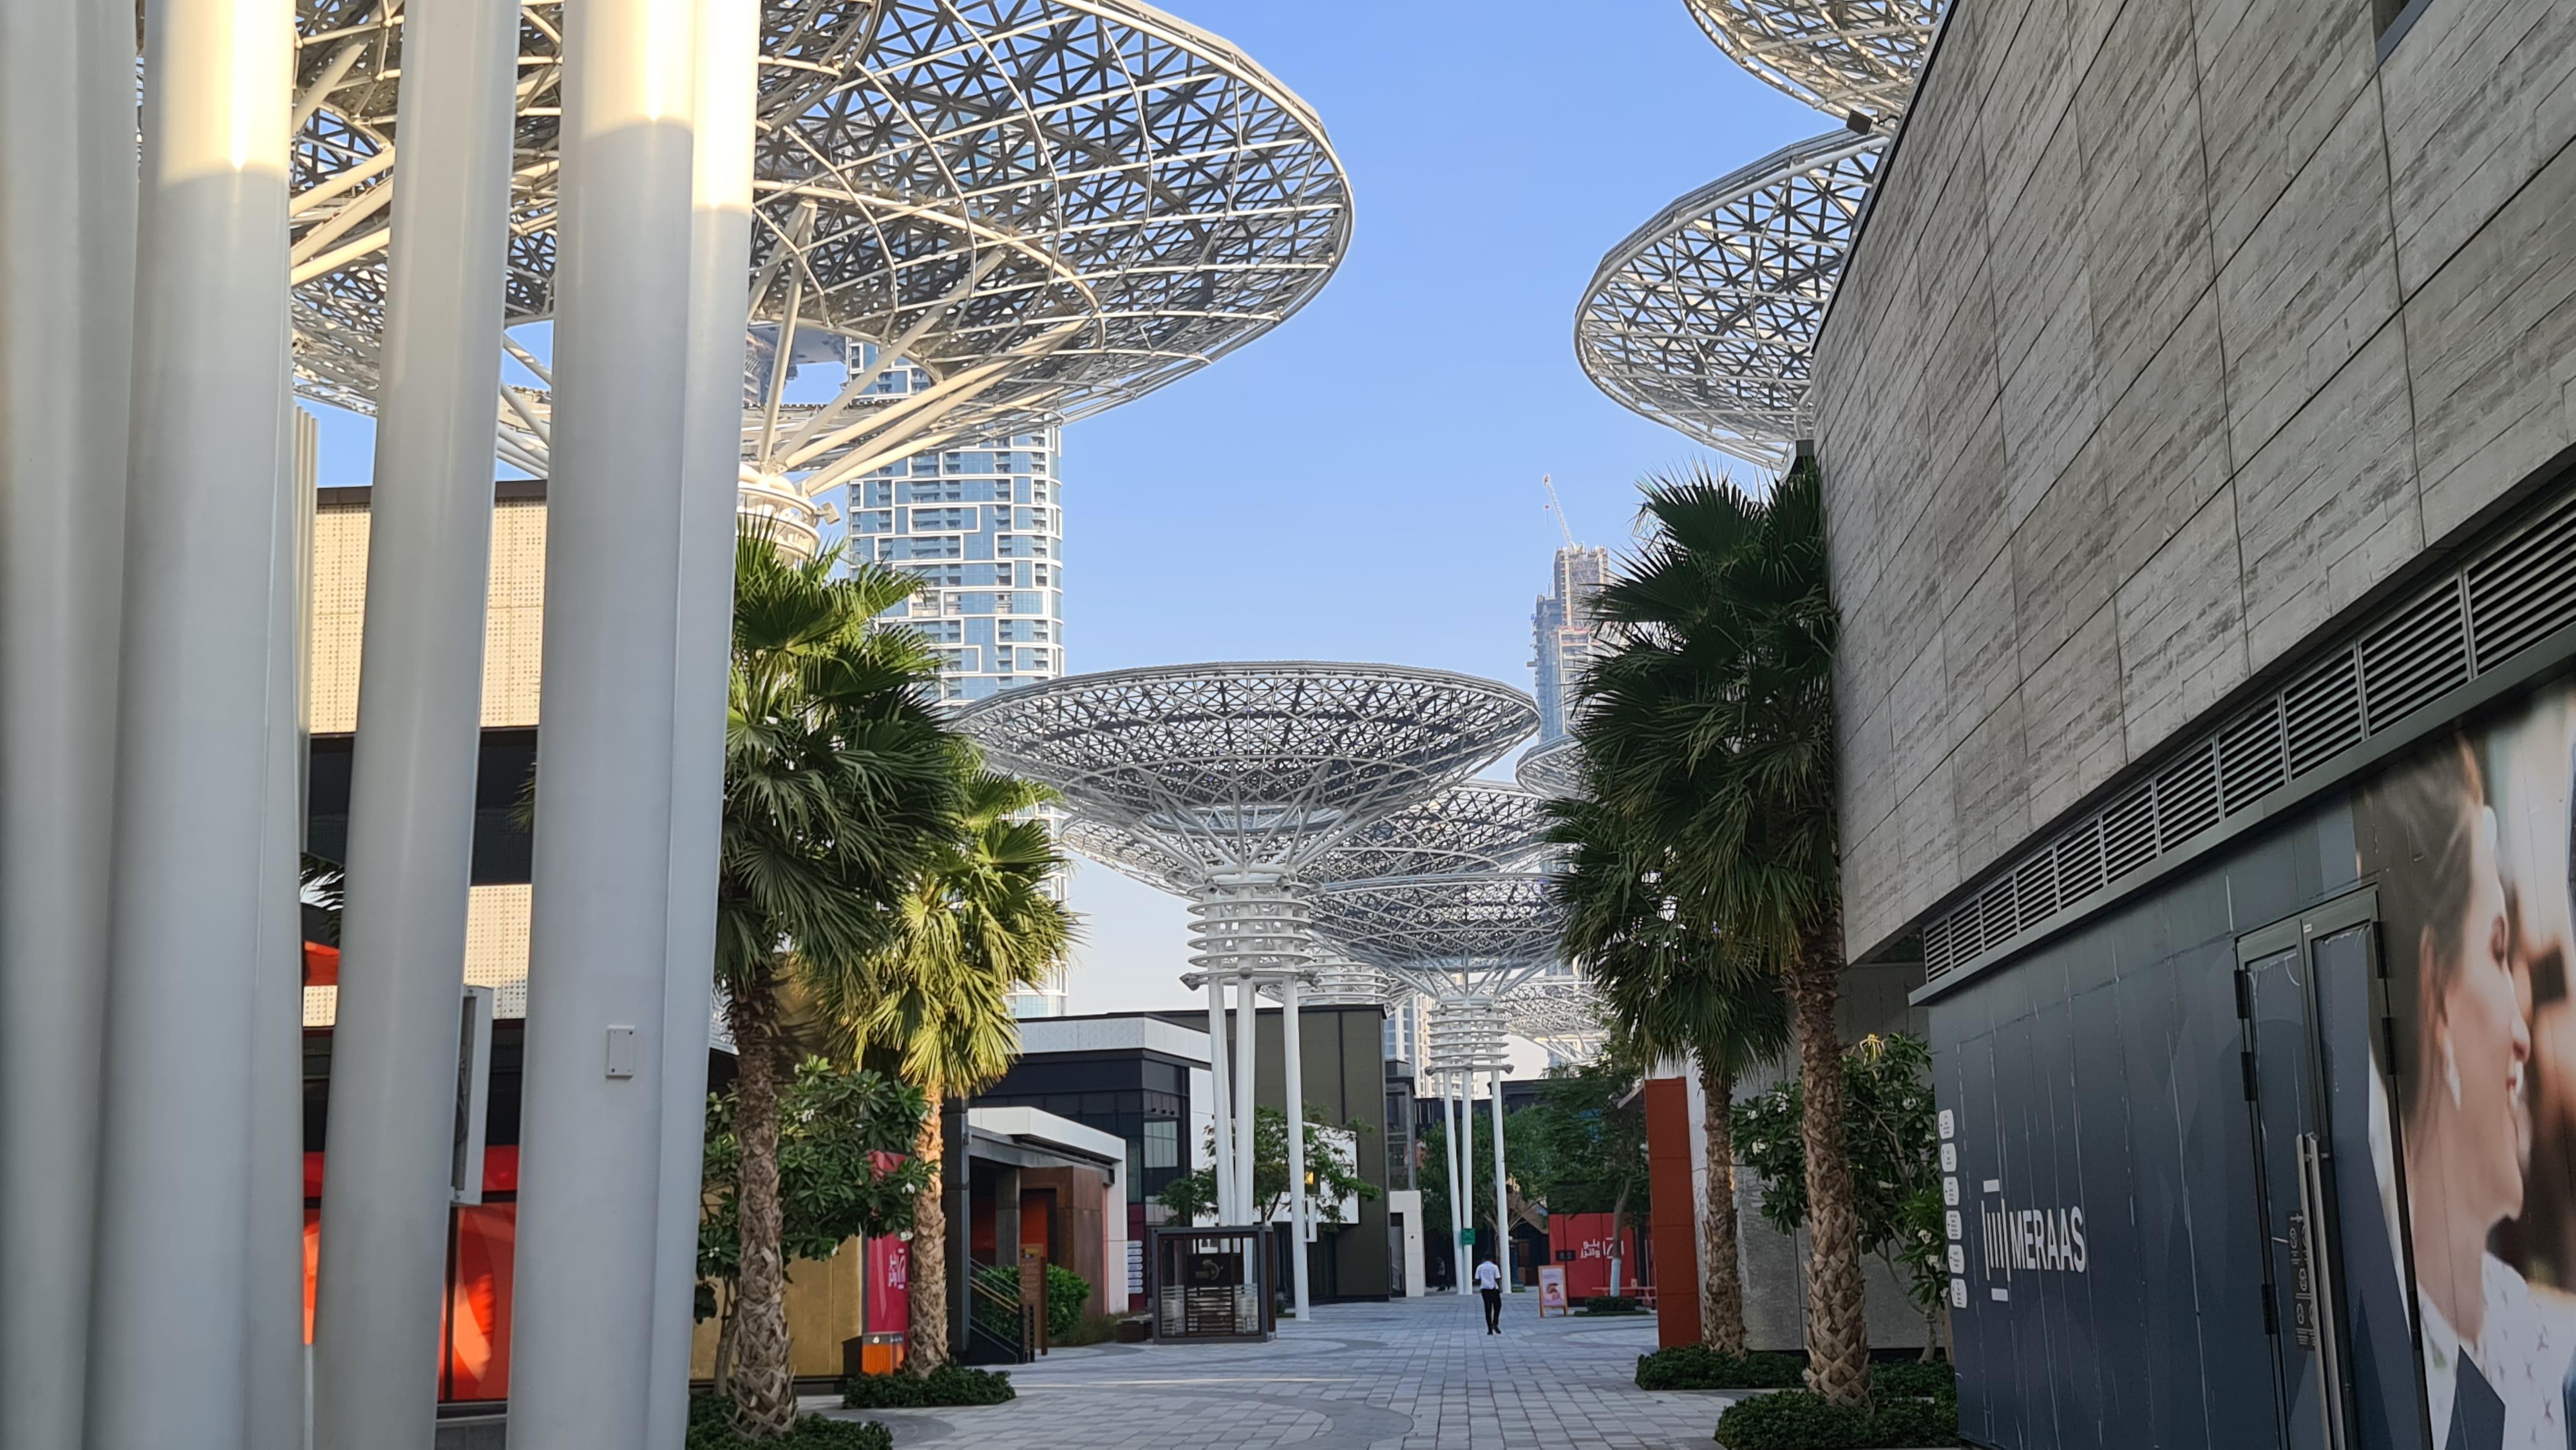 DUBAI EXPO 2020 - A COMPLETE GUIDE